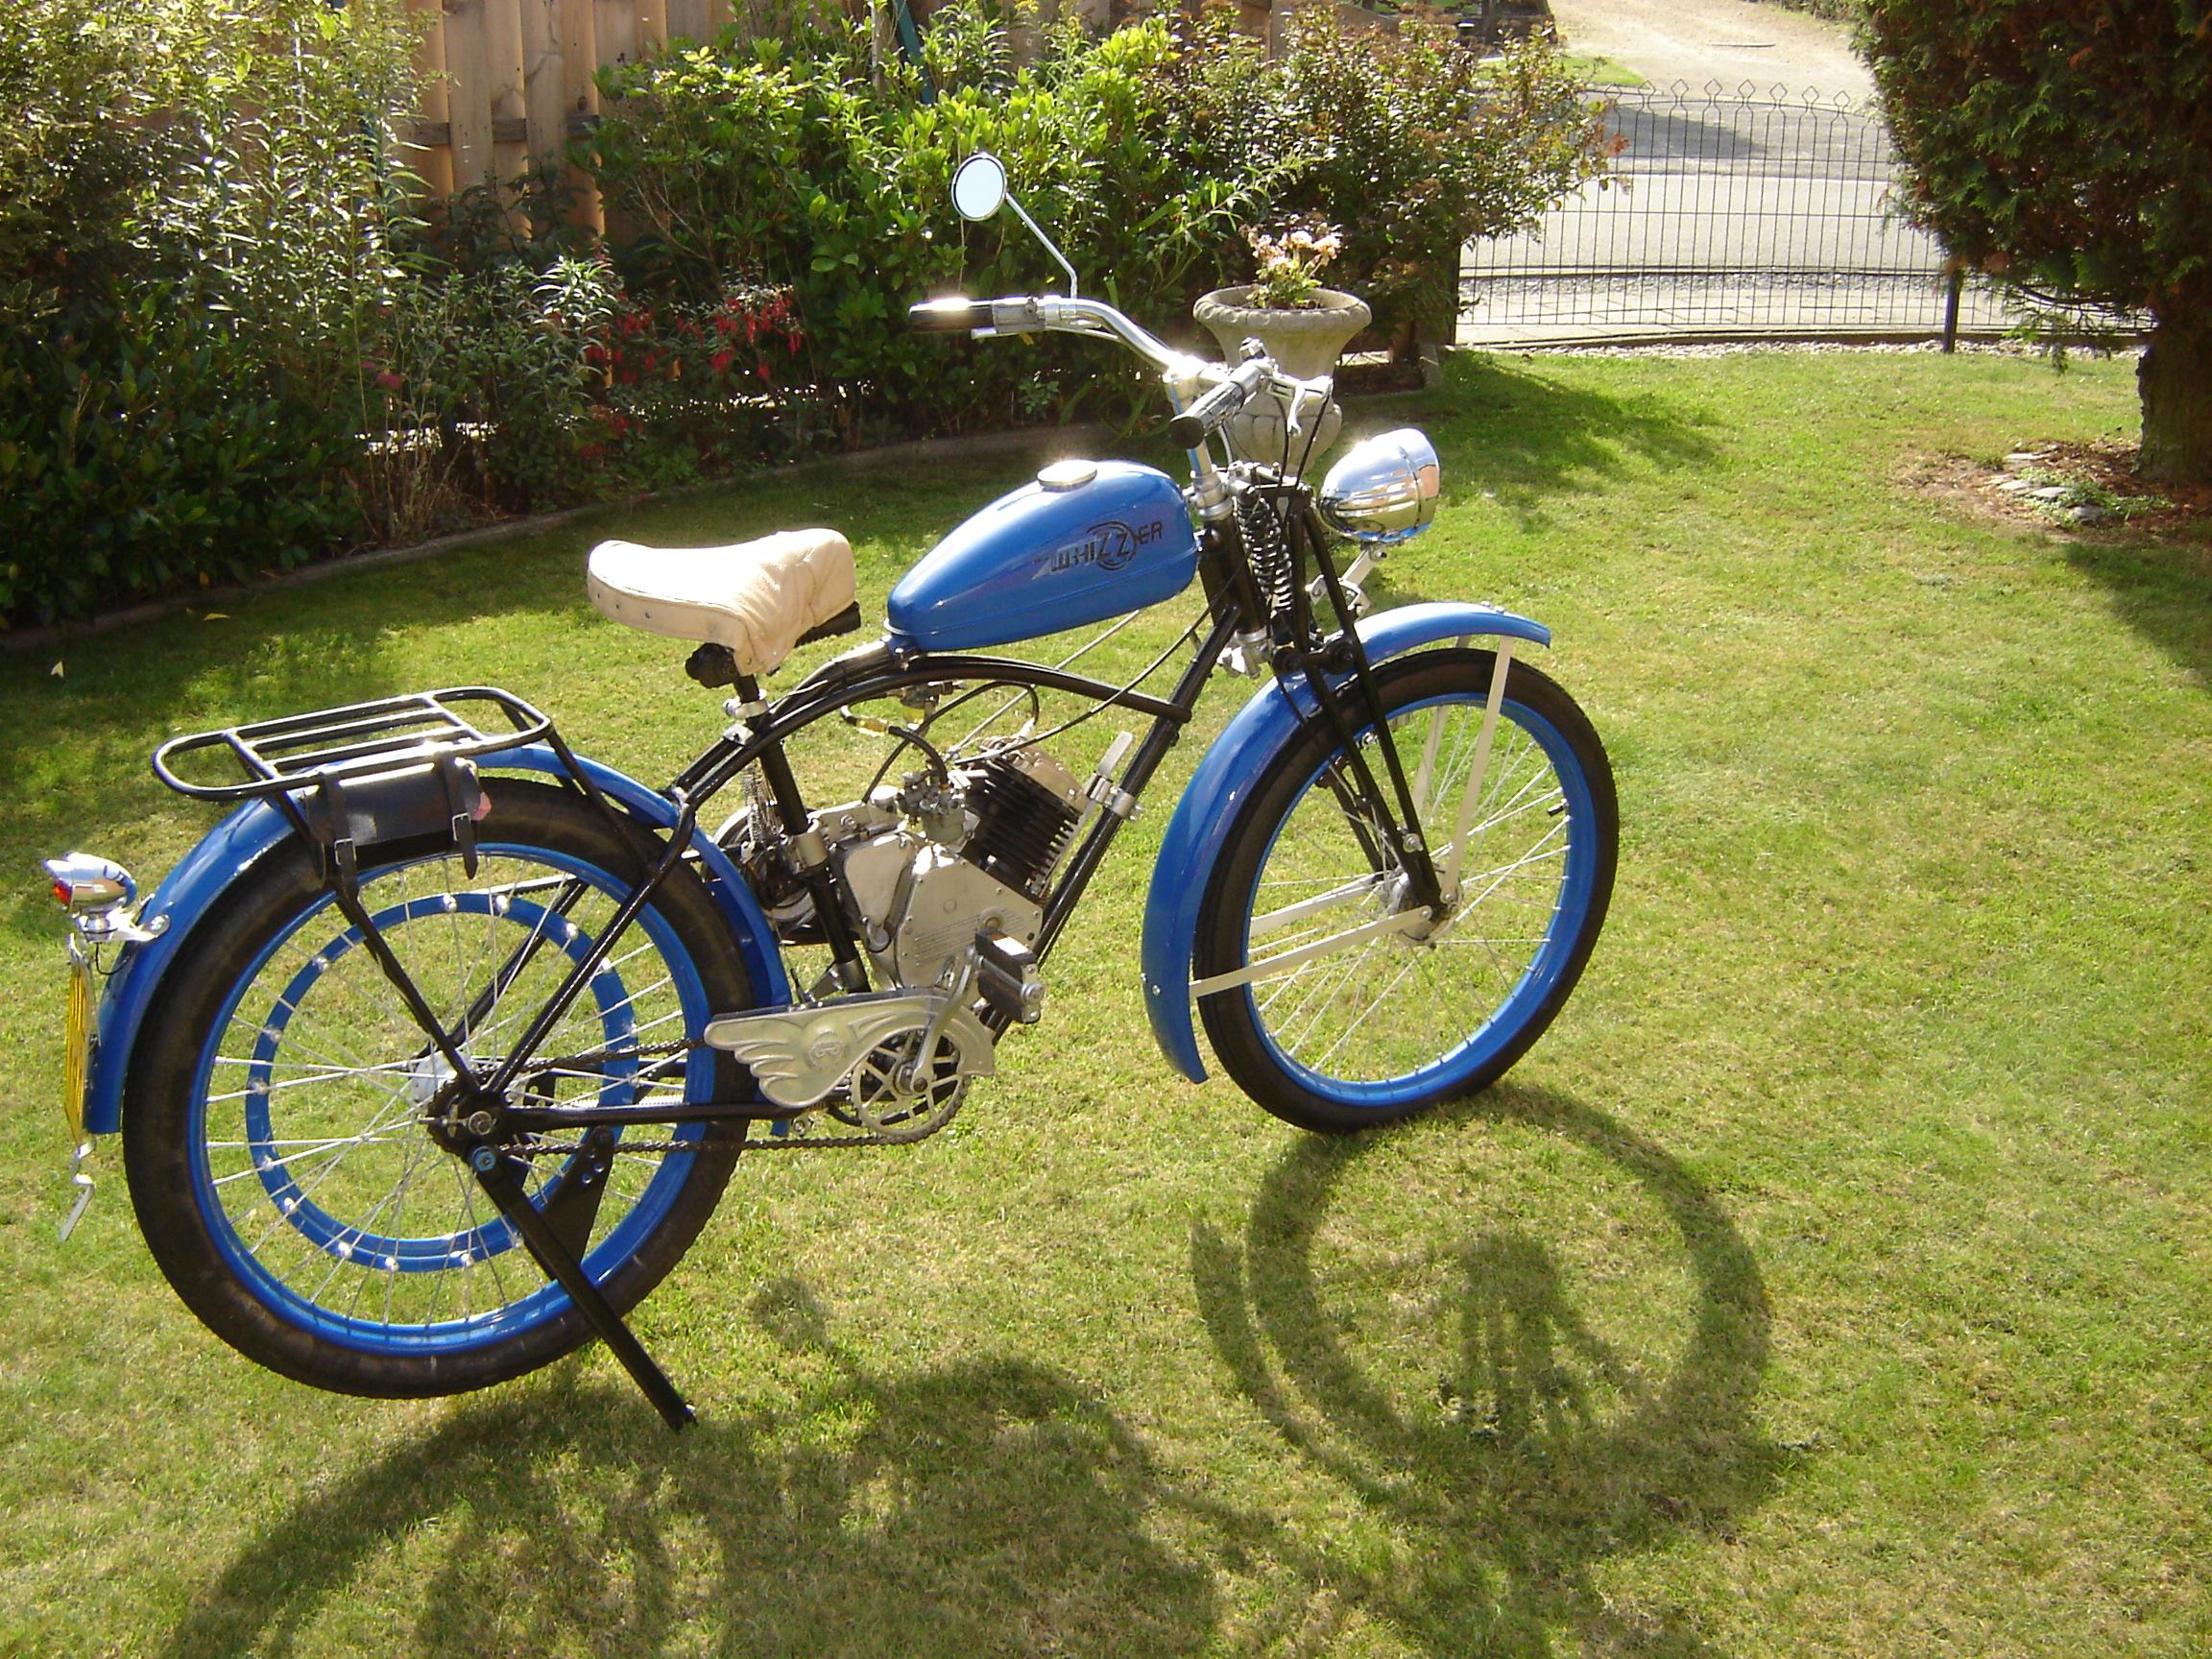 Vintage Whizzer Motorbikes From Belgium 171 Wc1manufacturer